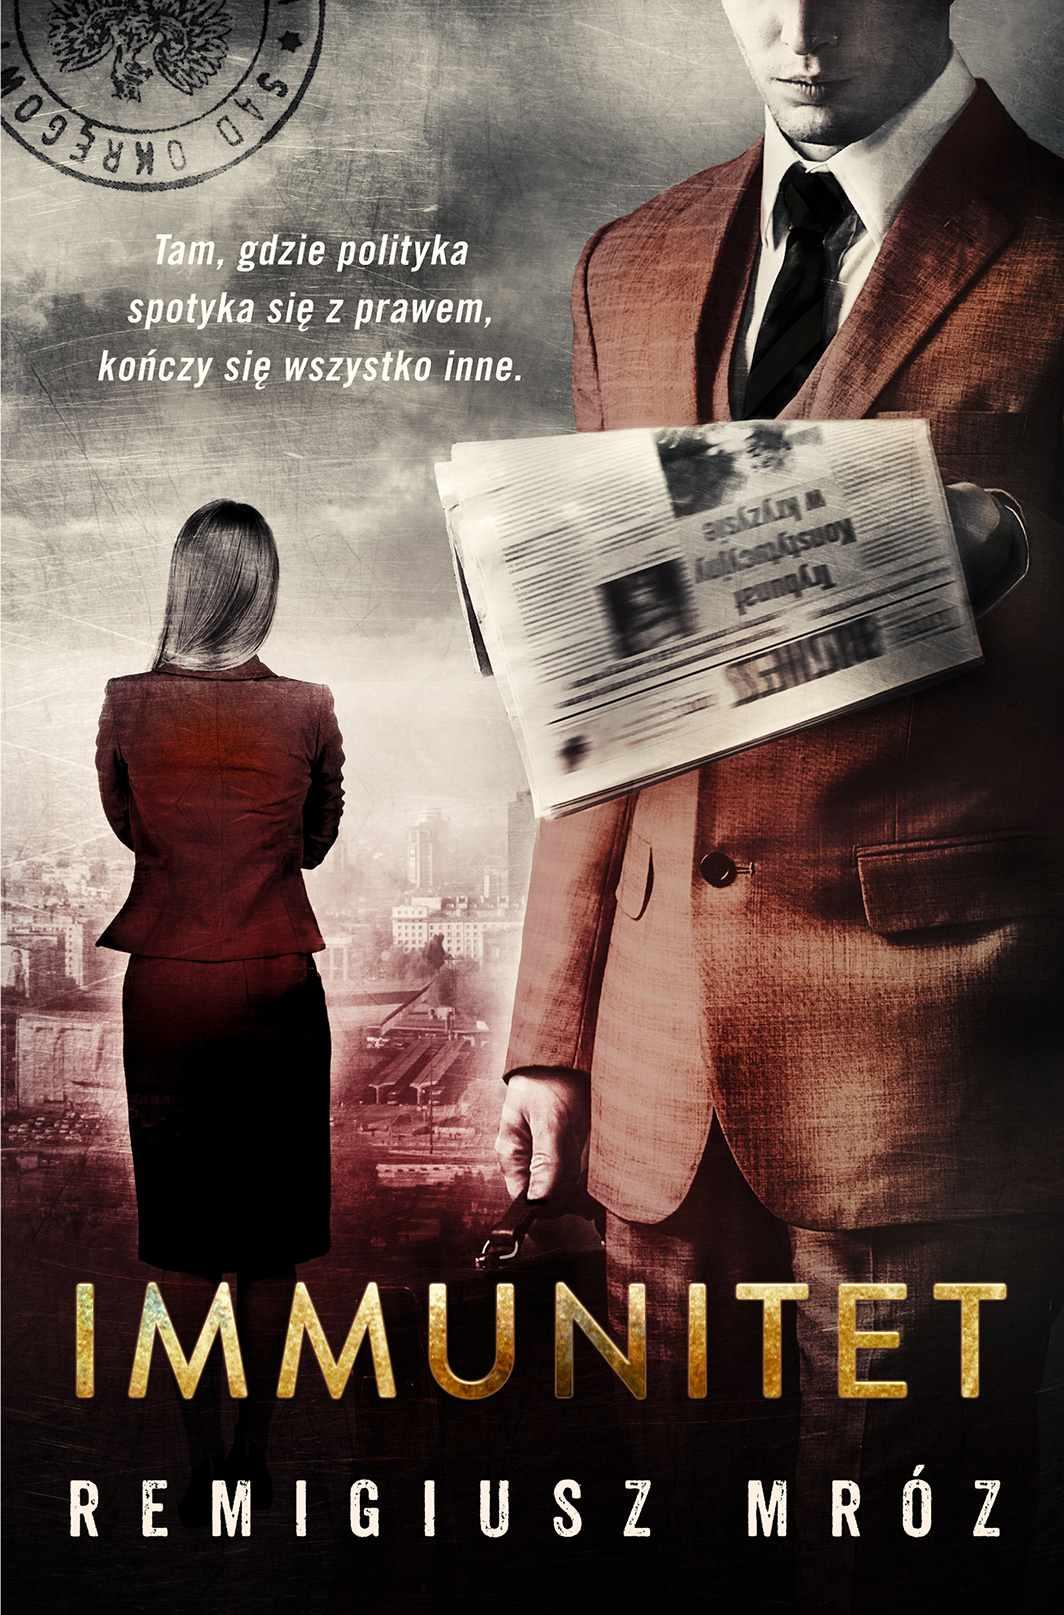 Immunitet - Ebook (Książka EPUB) do pobrania w formacie EPUB